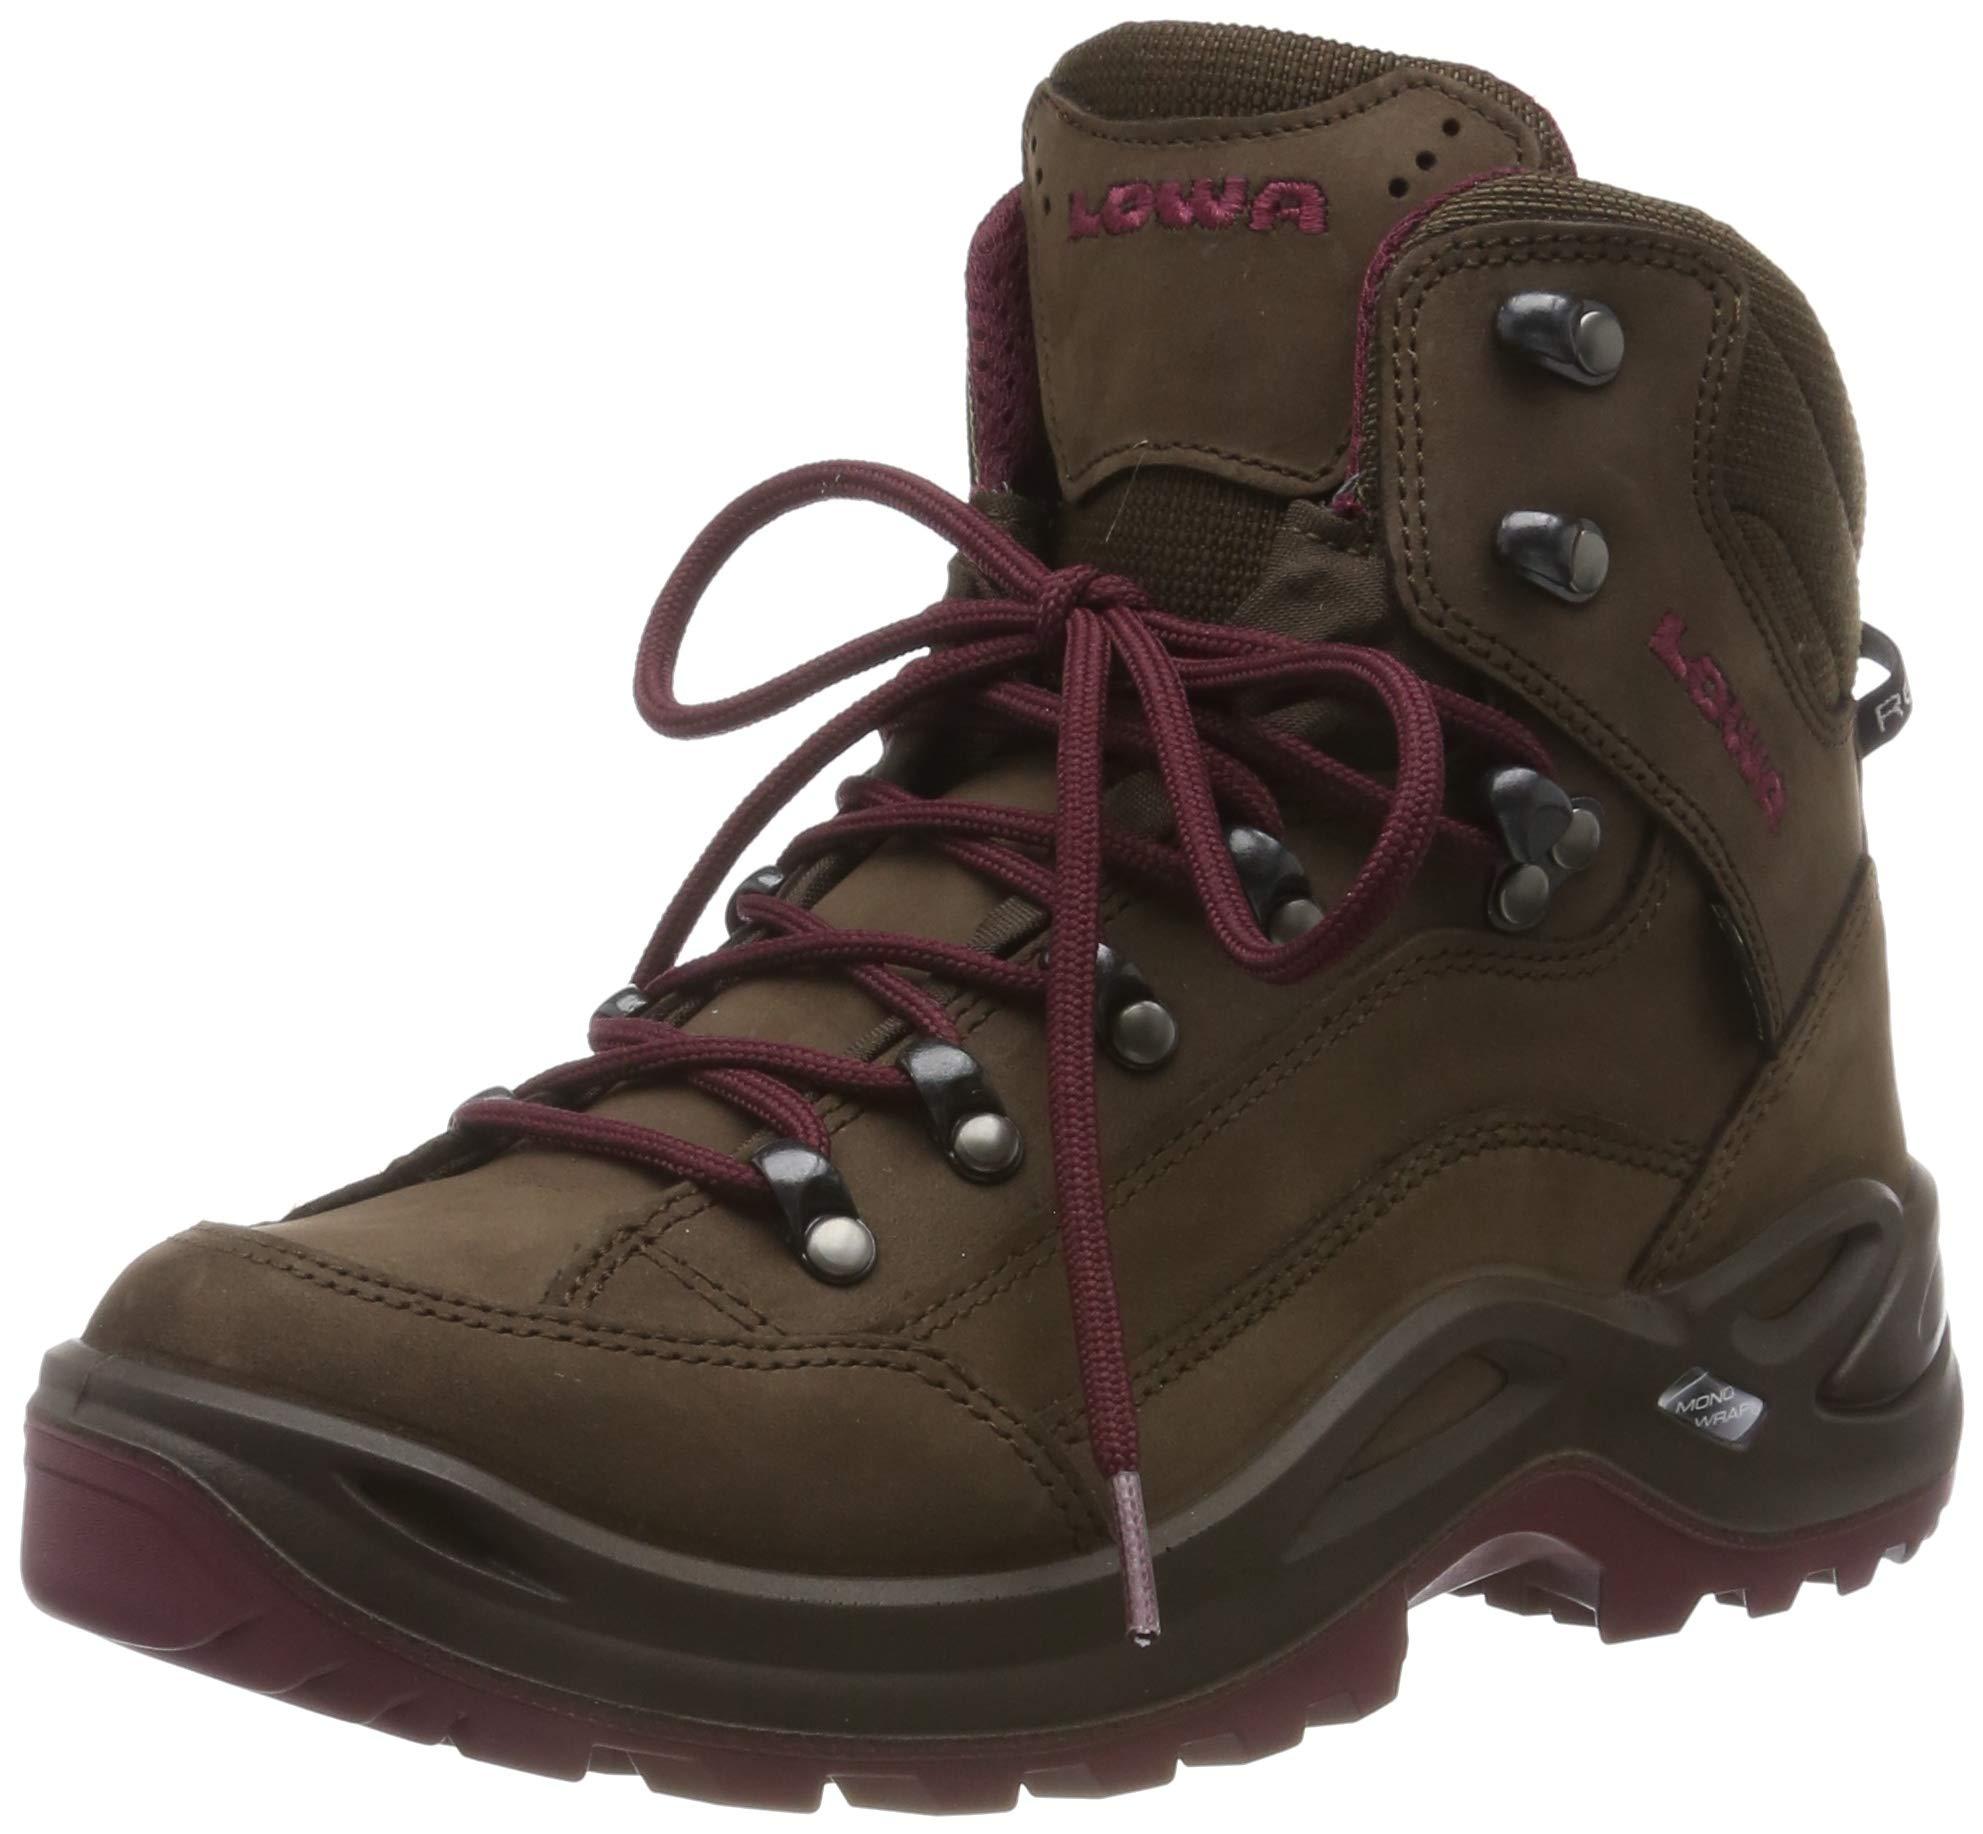 Renegade Gore Tex Espresso Womens Boots